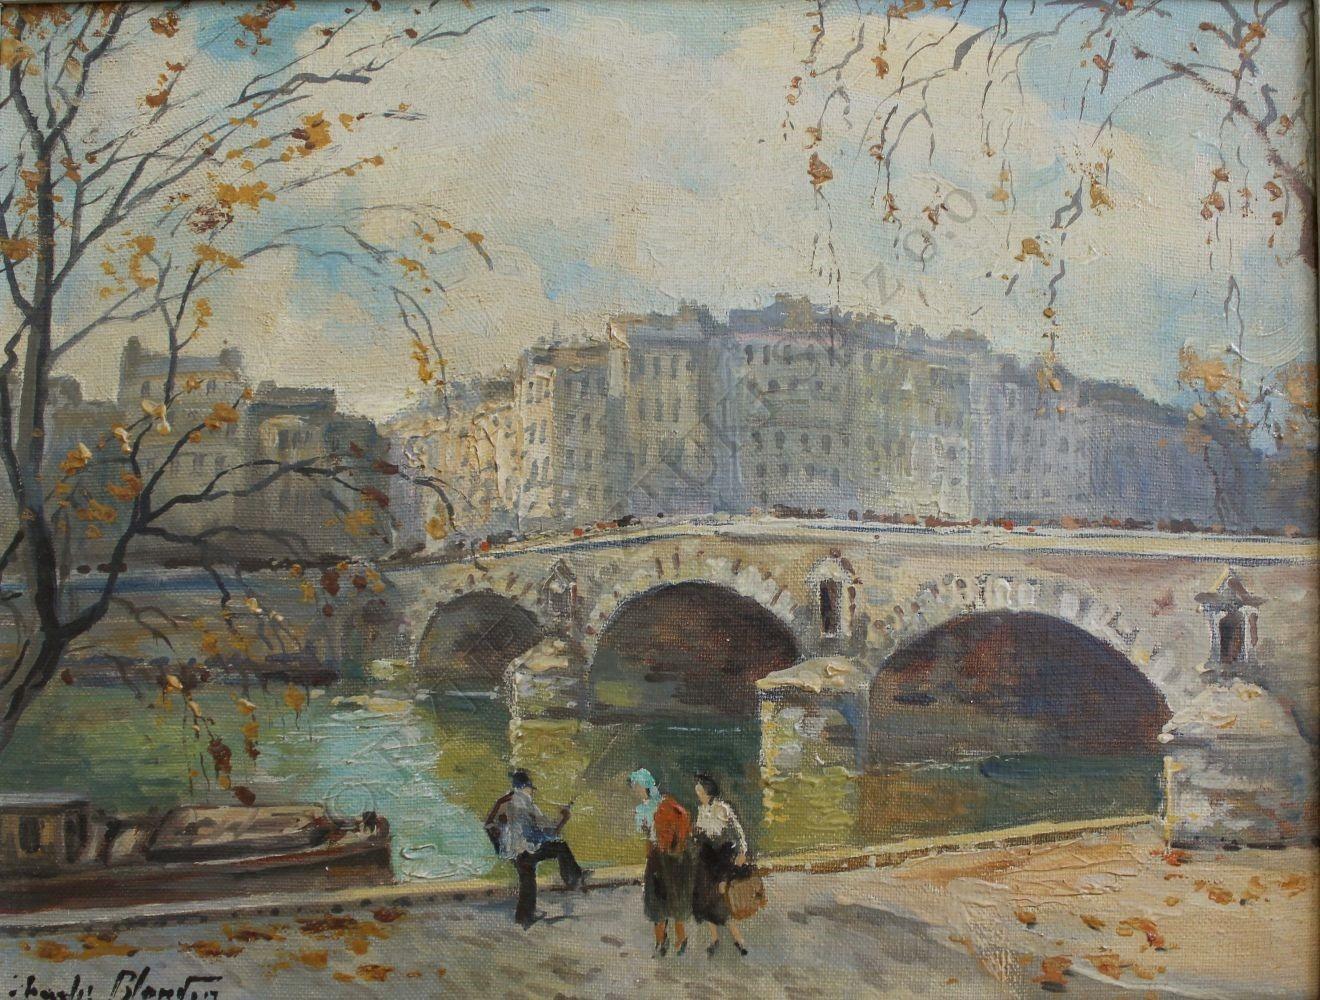 Charles Blondin (1913-1991), Pont Marie w Paryżu